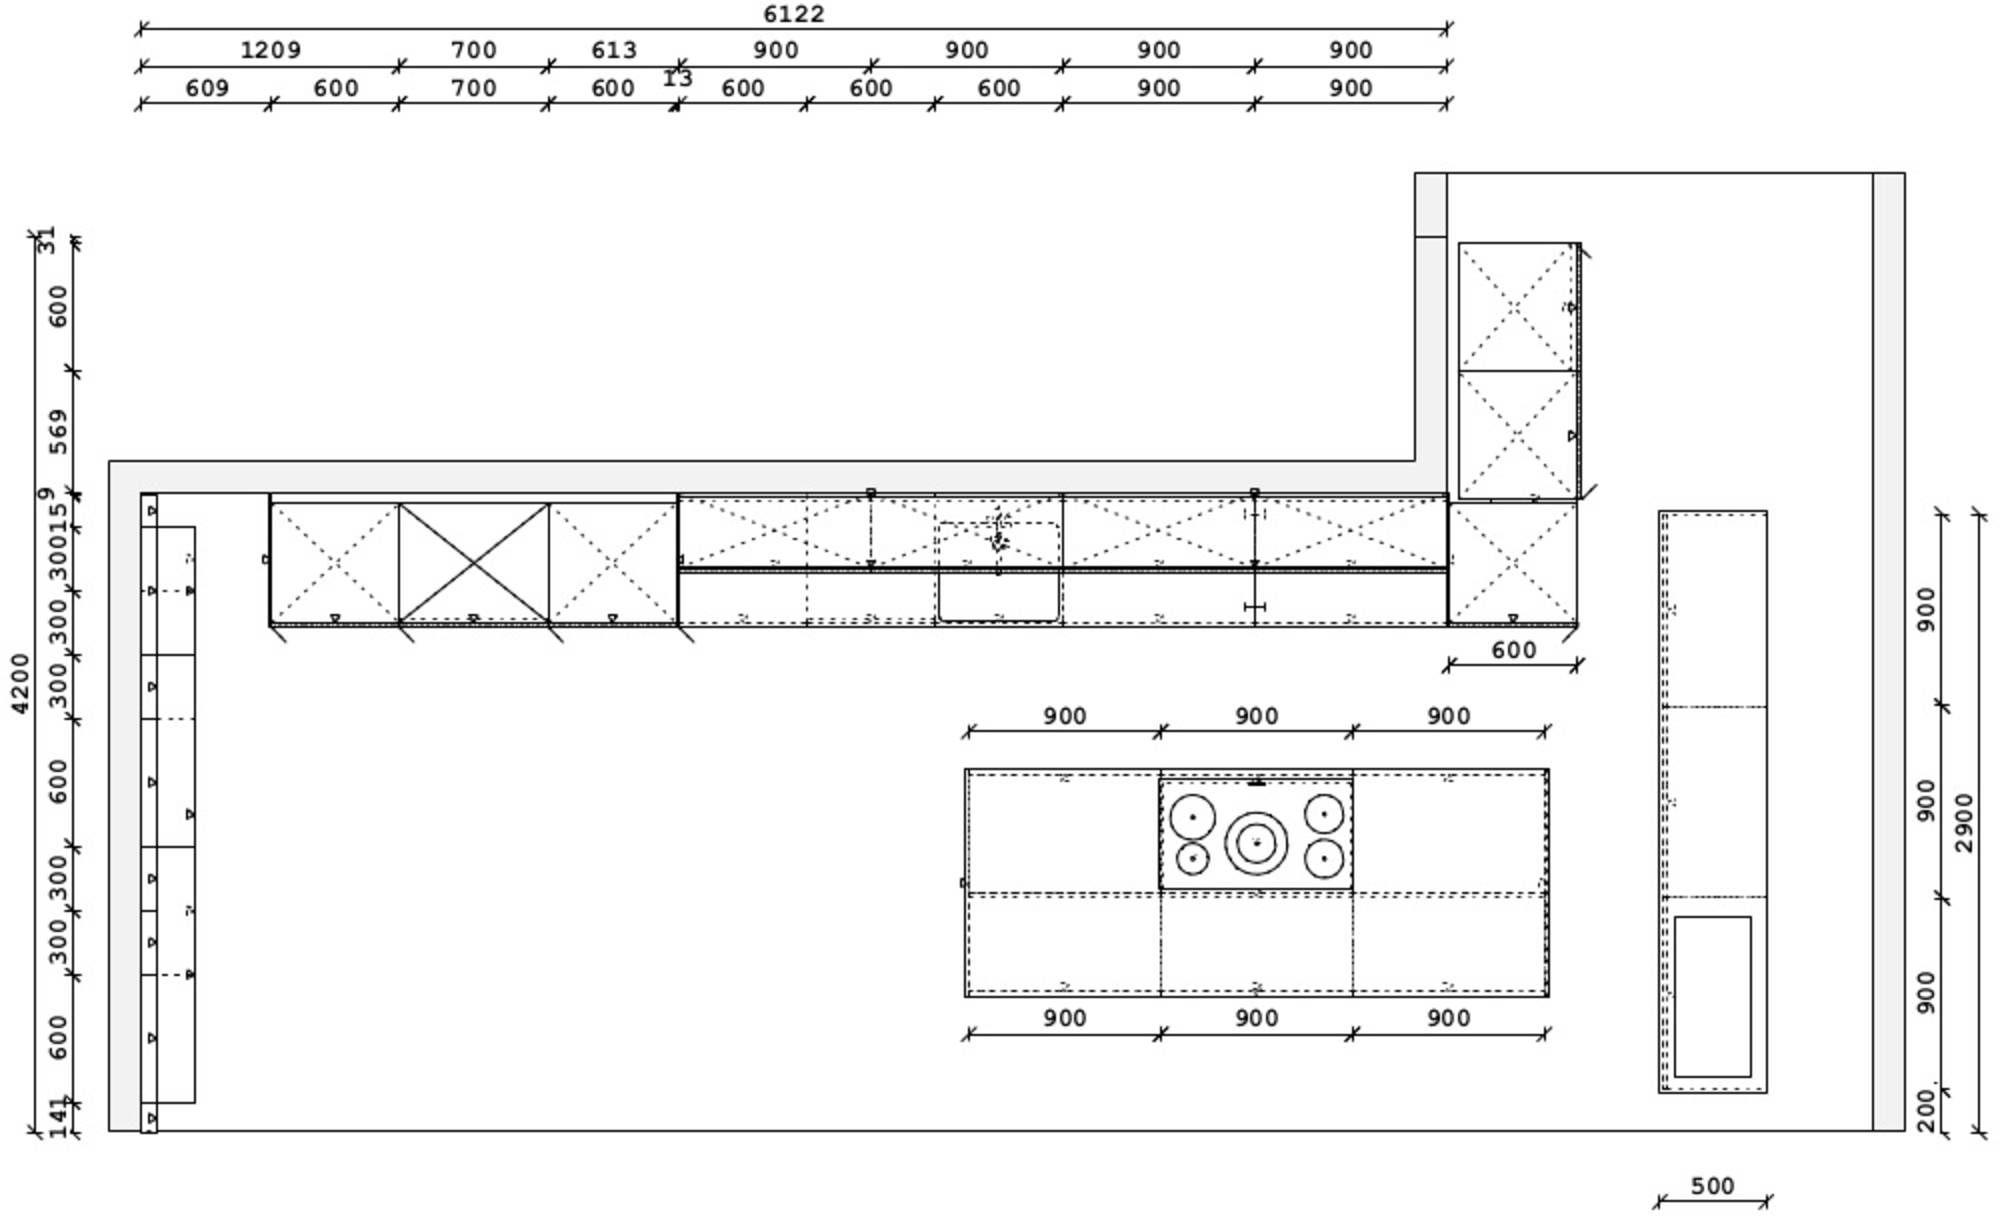 SieMatic eilandkeuken S2LM / 88LM / 44N / C10 (501